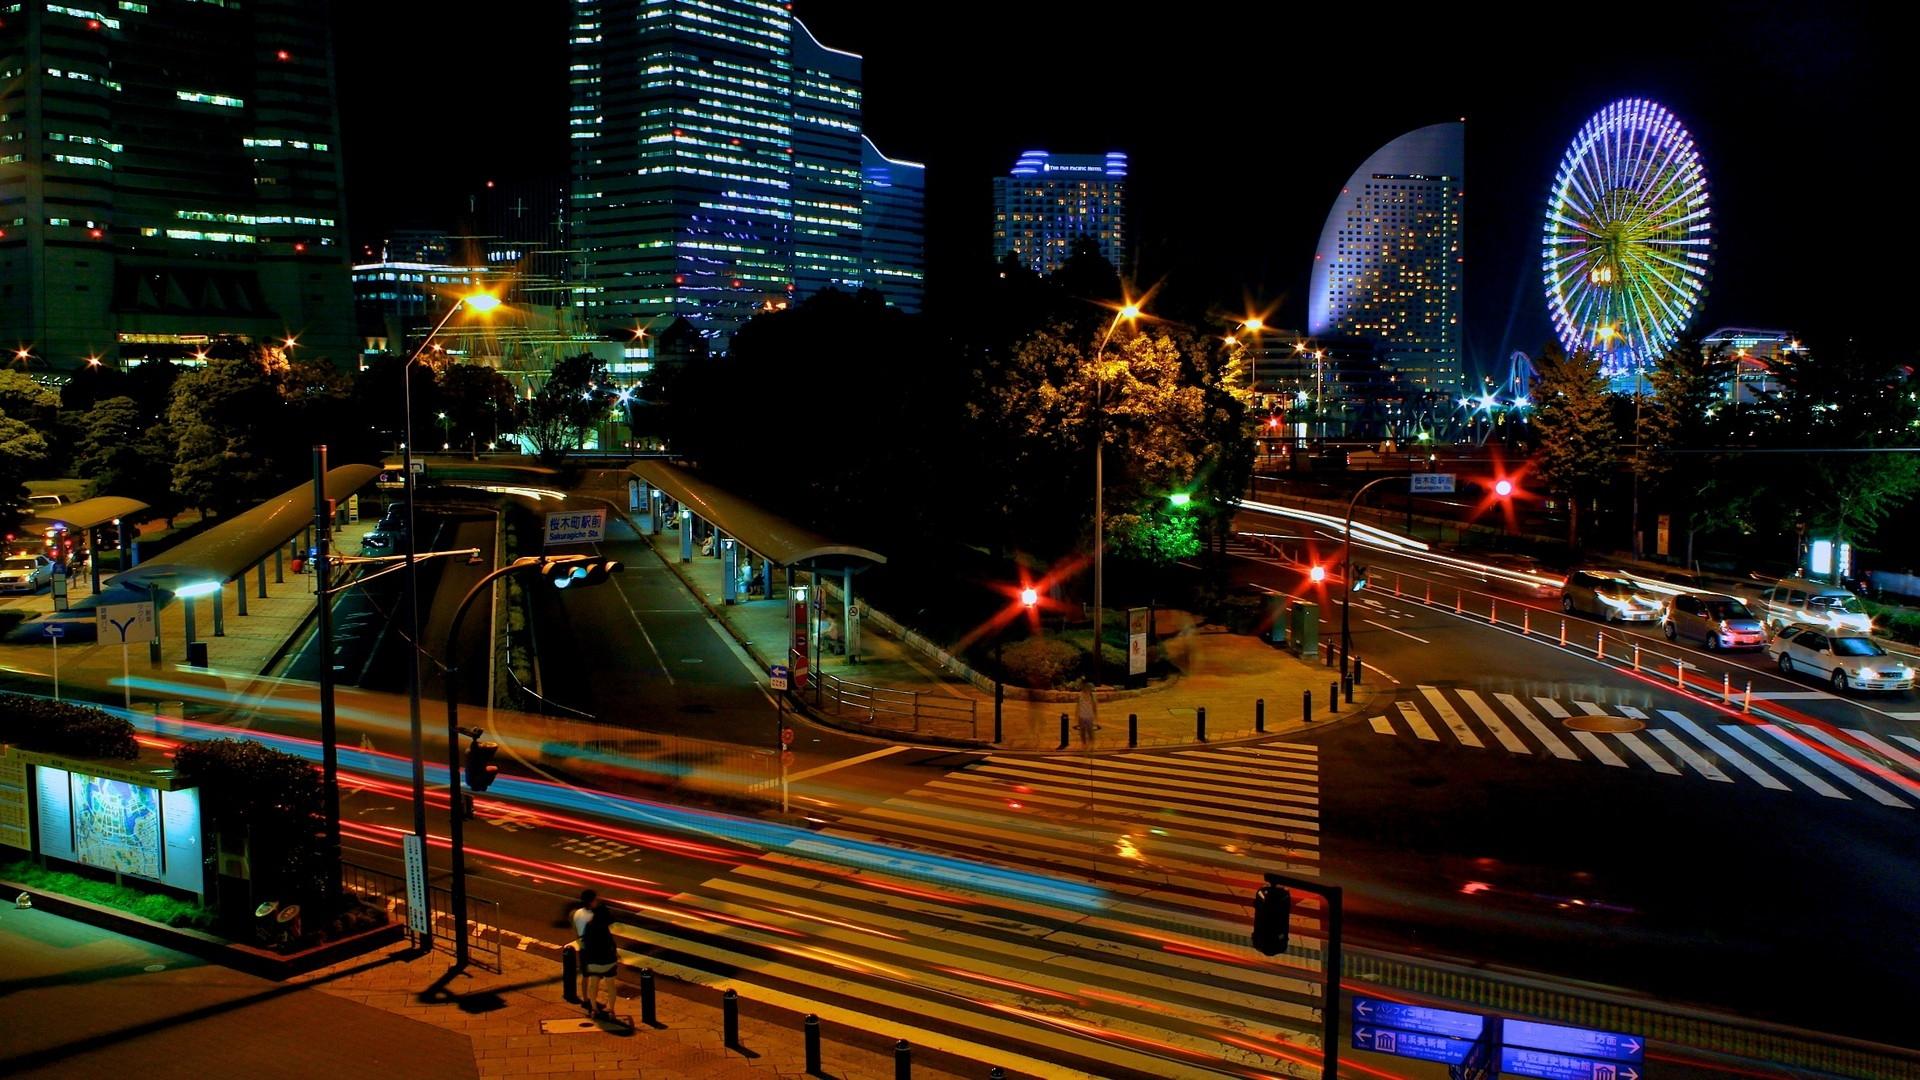 Best Wallpaper Night Evening - Japan-cityscape-night-evening-metropolis-Tokyo-light-beautiful-metropolitan-area-lights-city-719018  You Should Have-896525.jpg